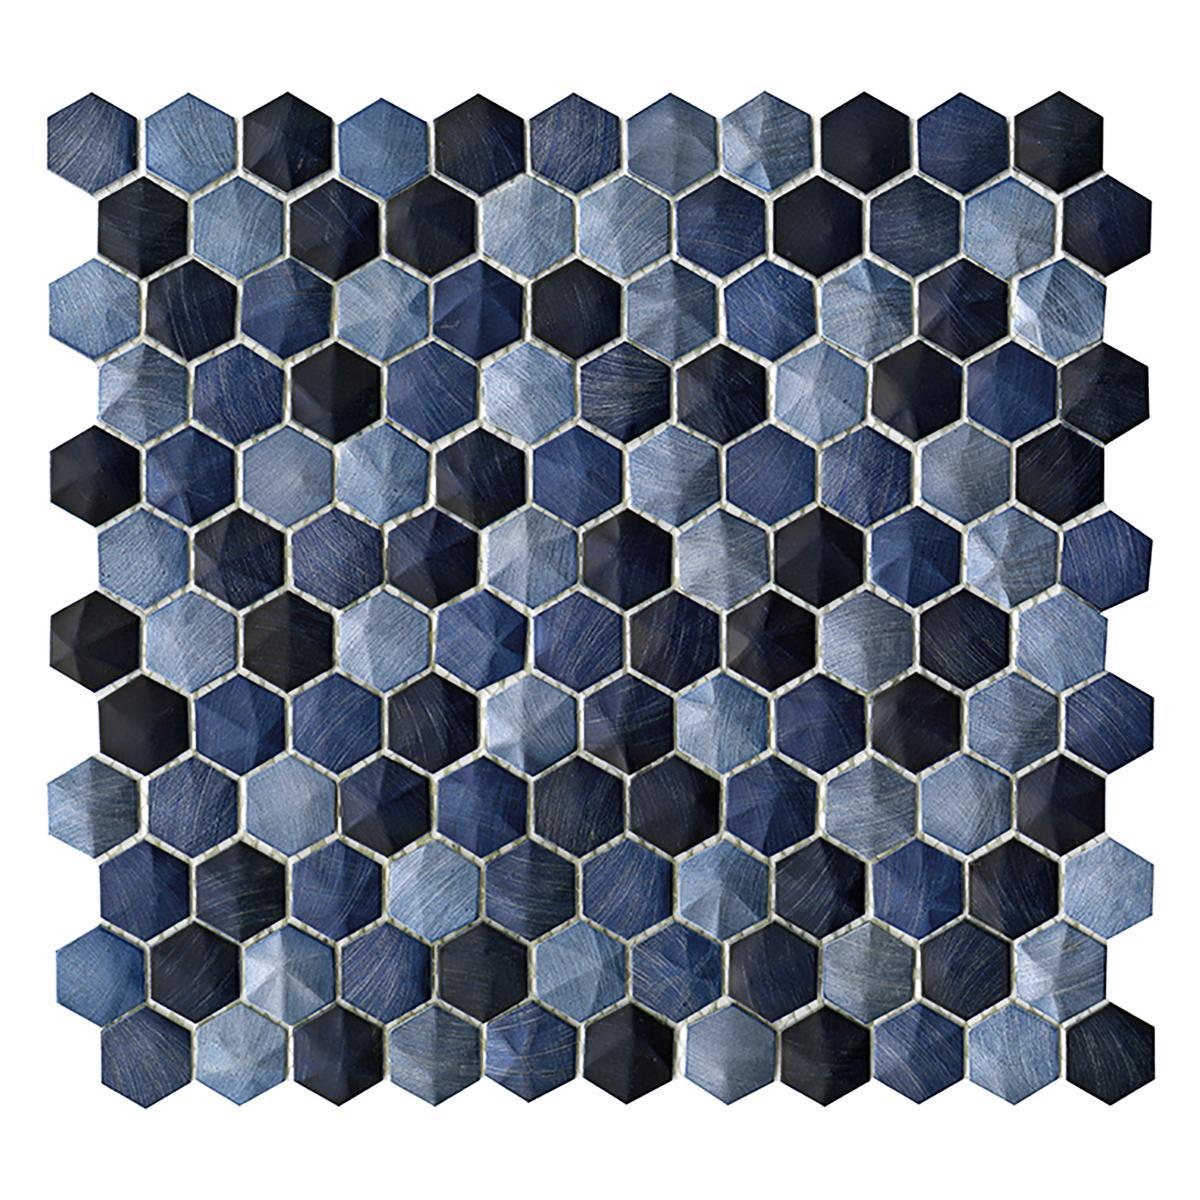 Mosaico Colors Azul/Celeste Mate - 28.5X30.5 cm - 1 pza